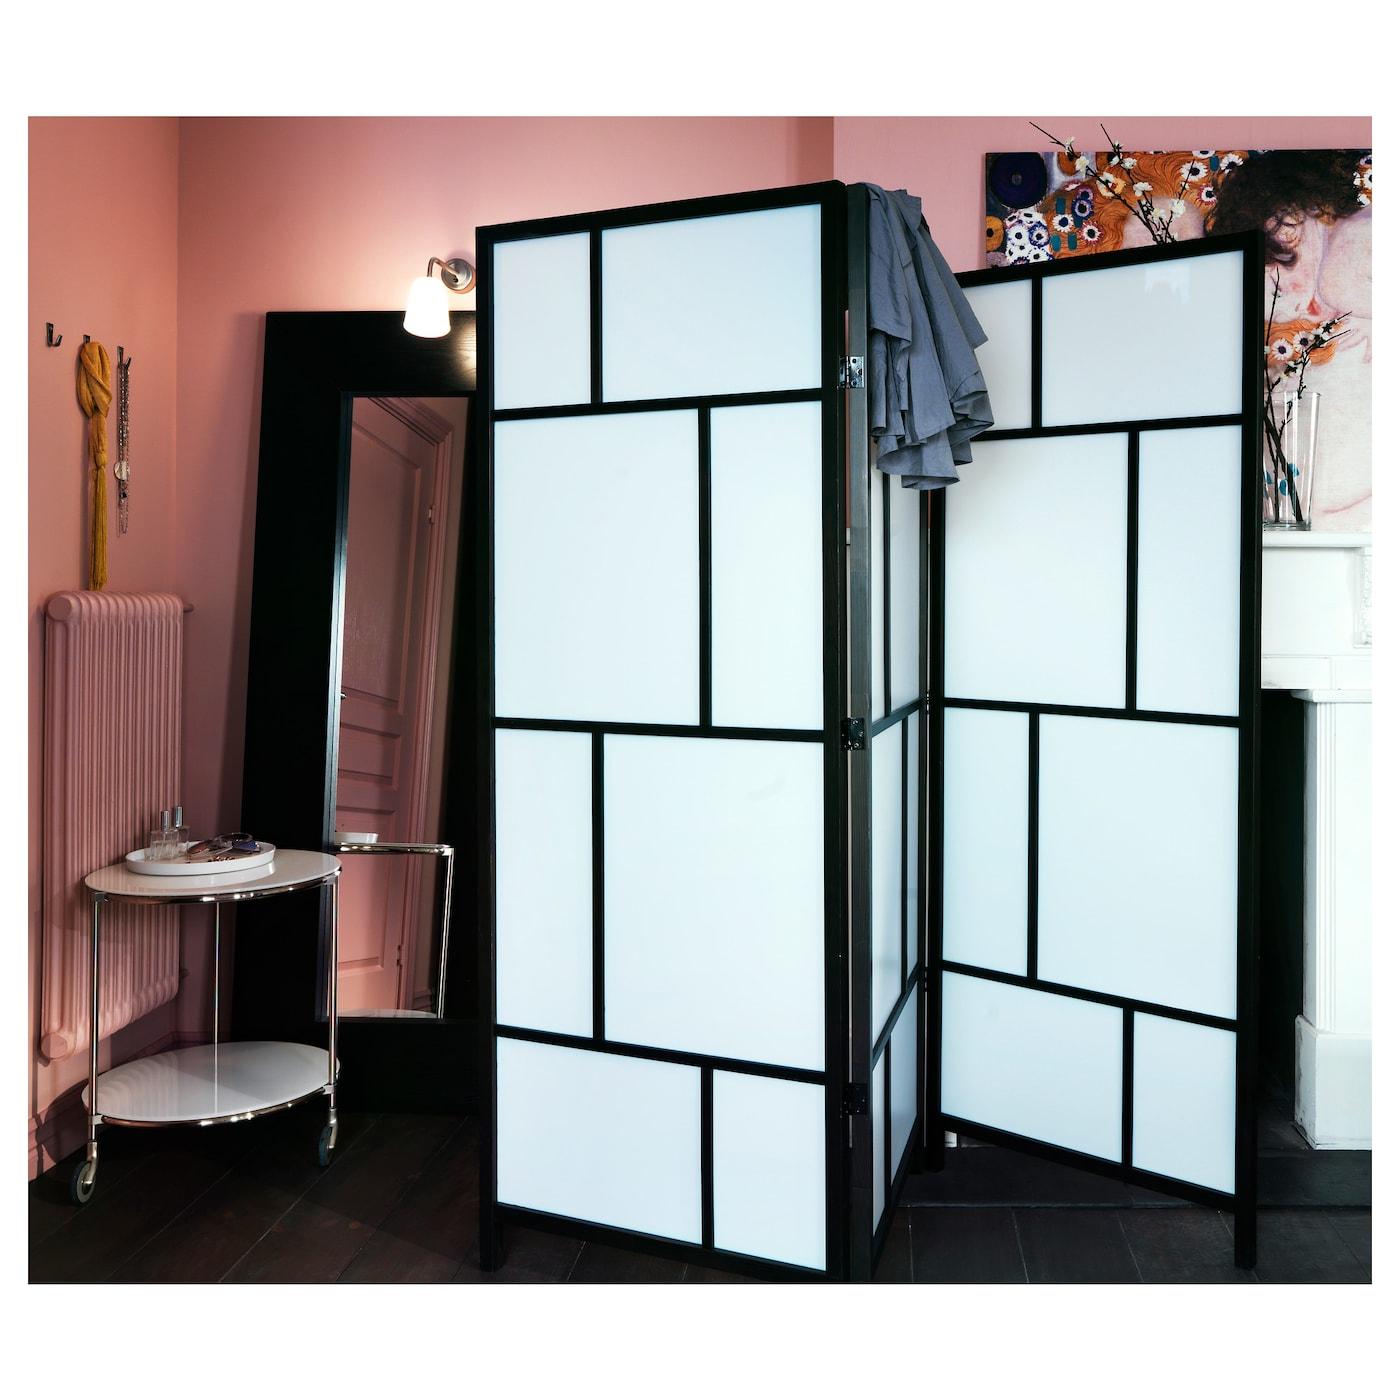 Remarkable Risor Room Divider White Black Download Free Architecture Designs Fluibritishbridgeorg